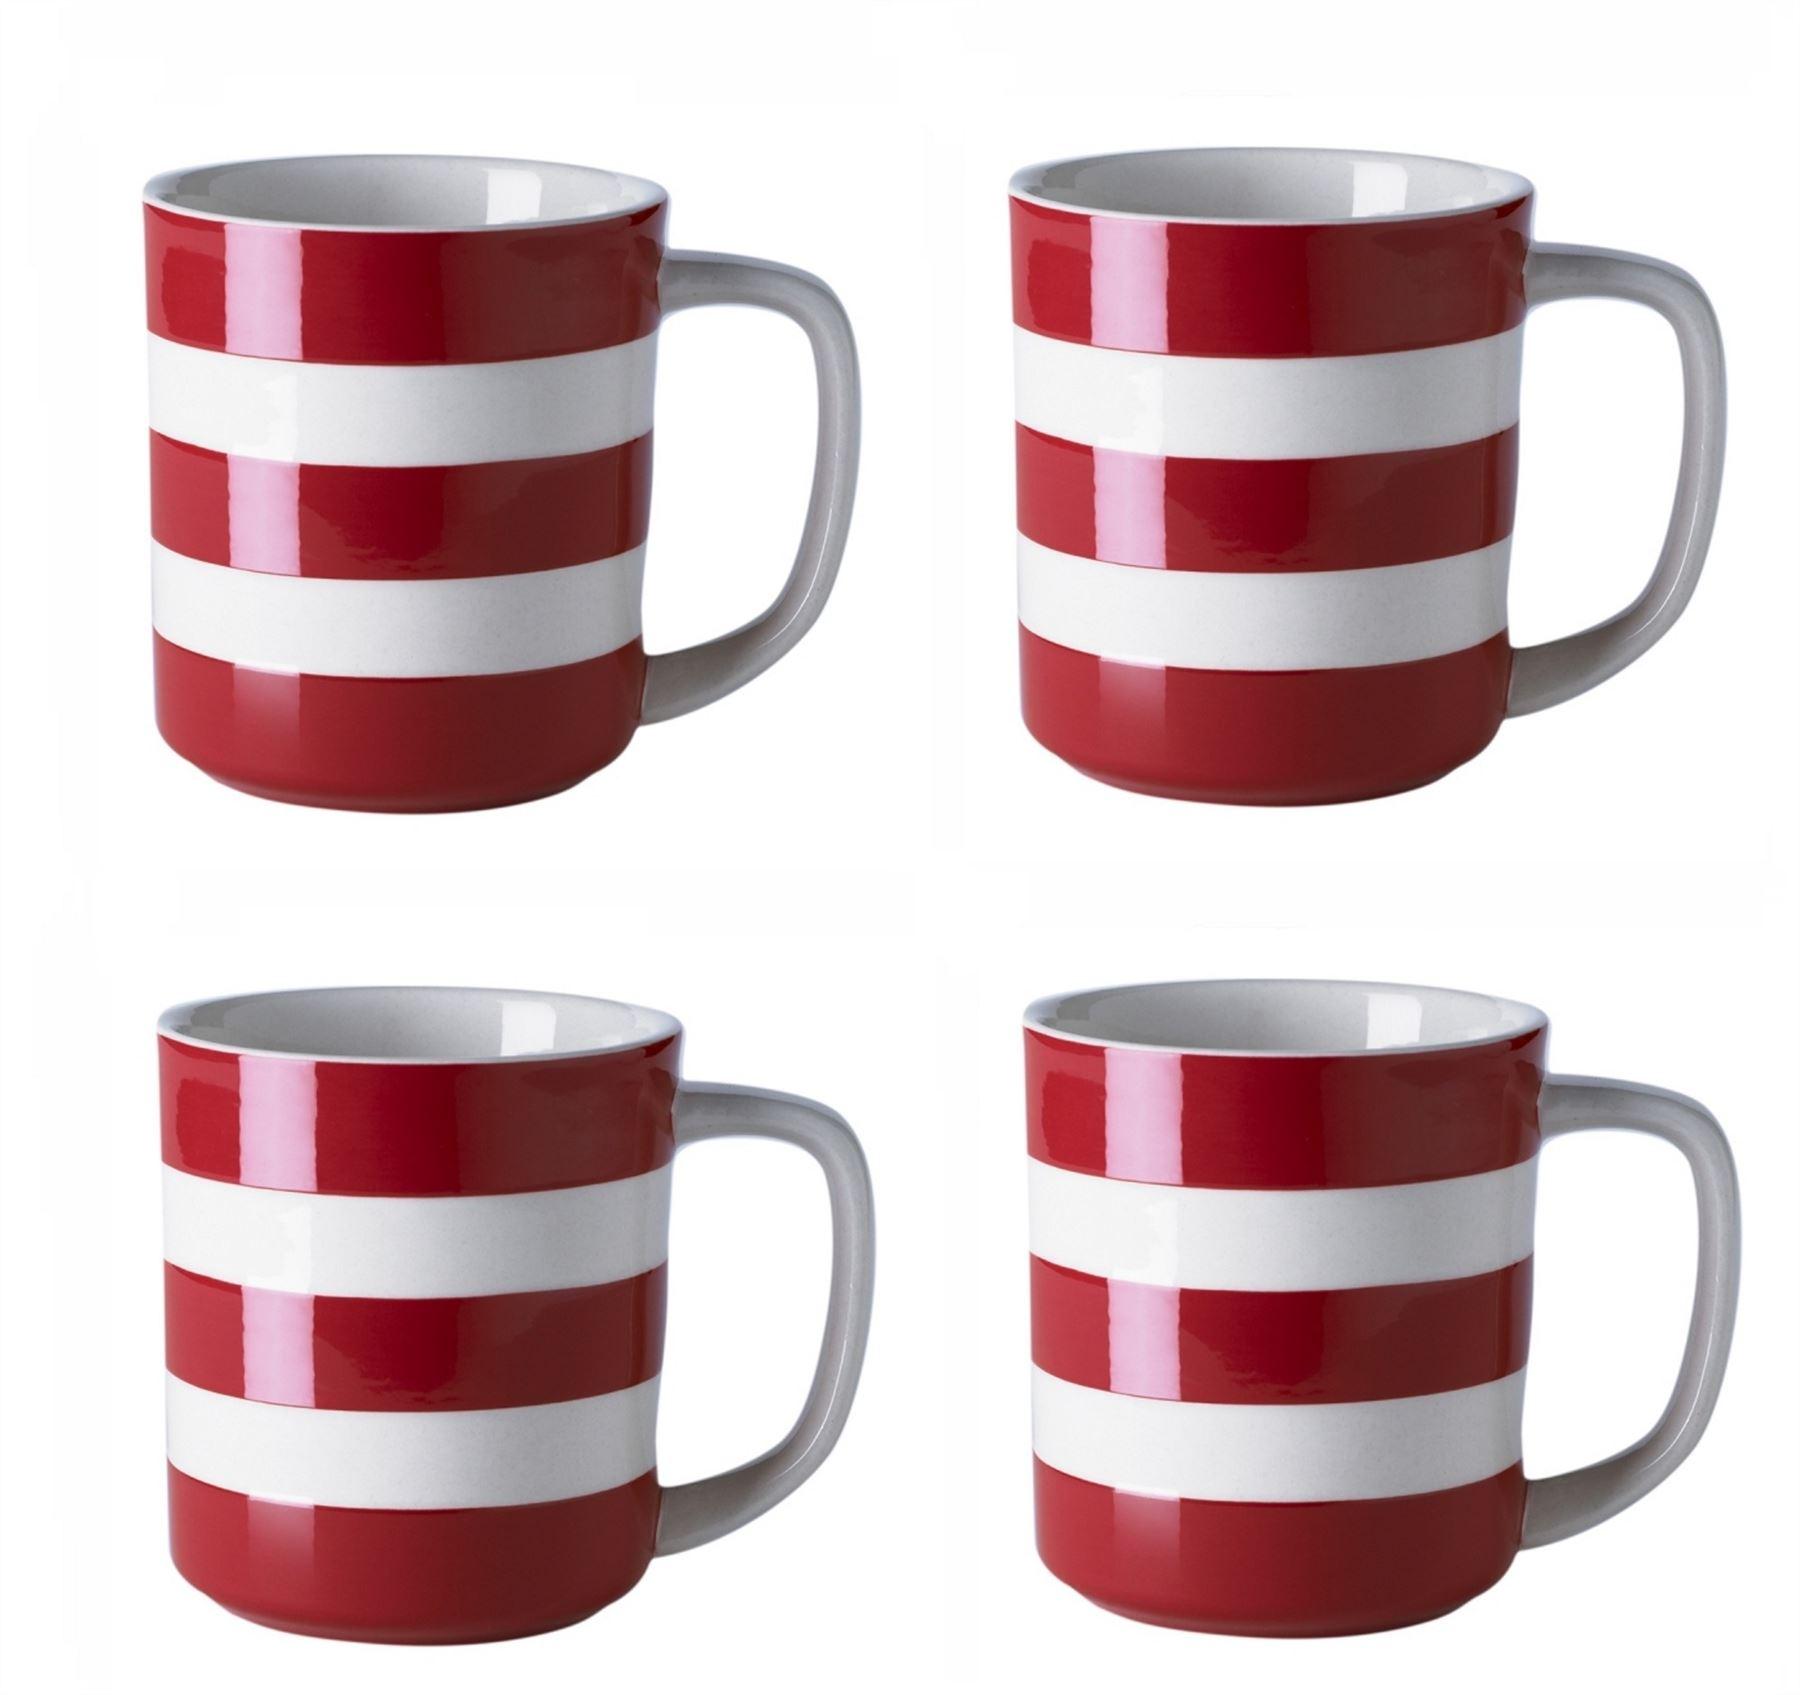 cornishware blue white stripe sets of coffee cups mugs 4oz 6oz